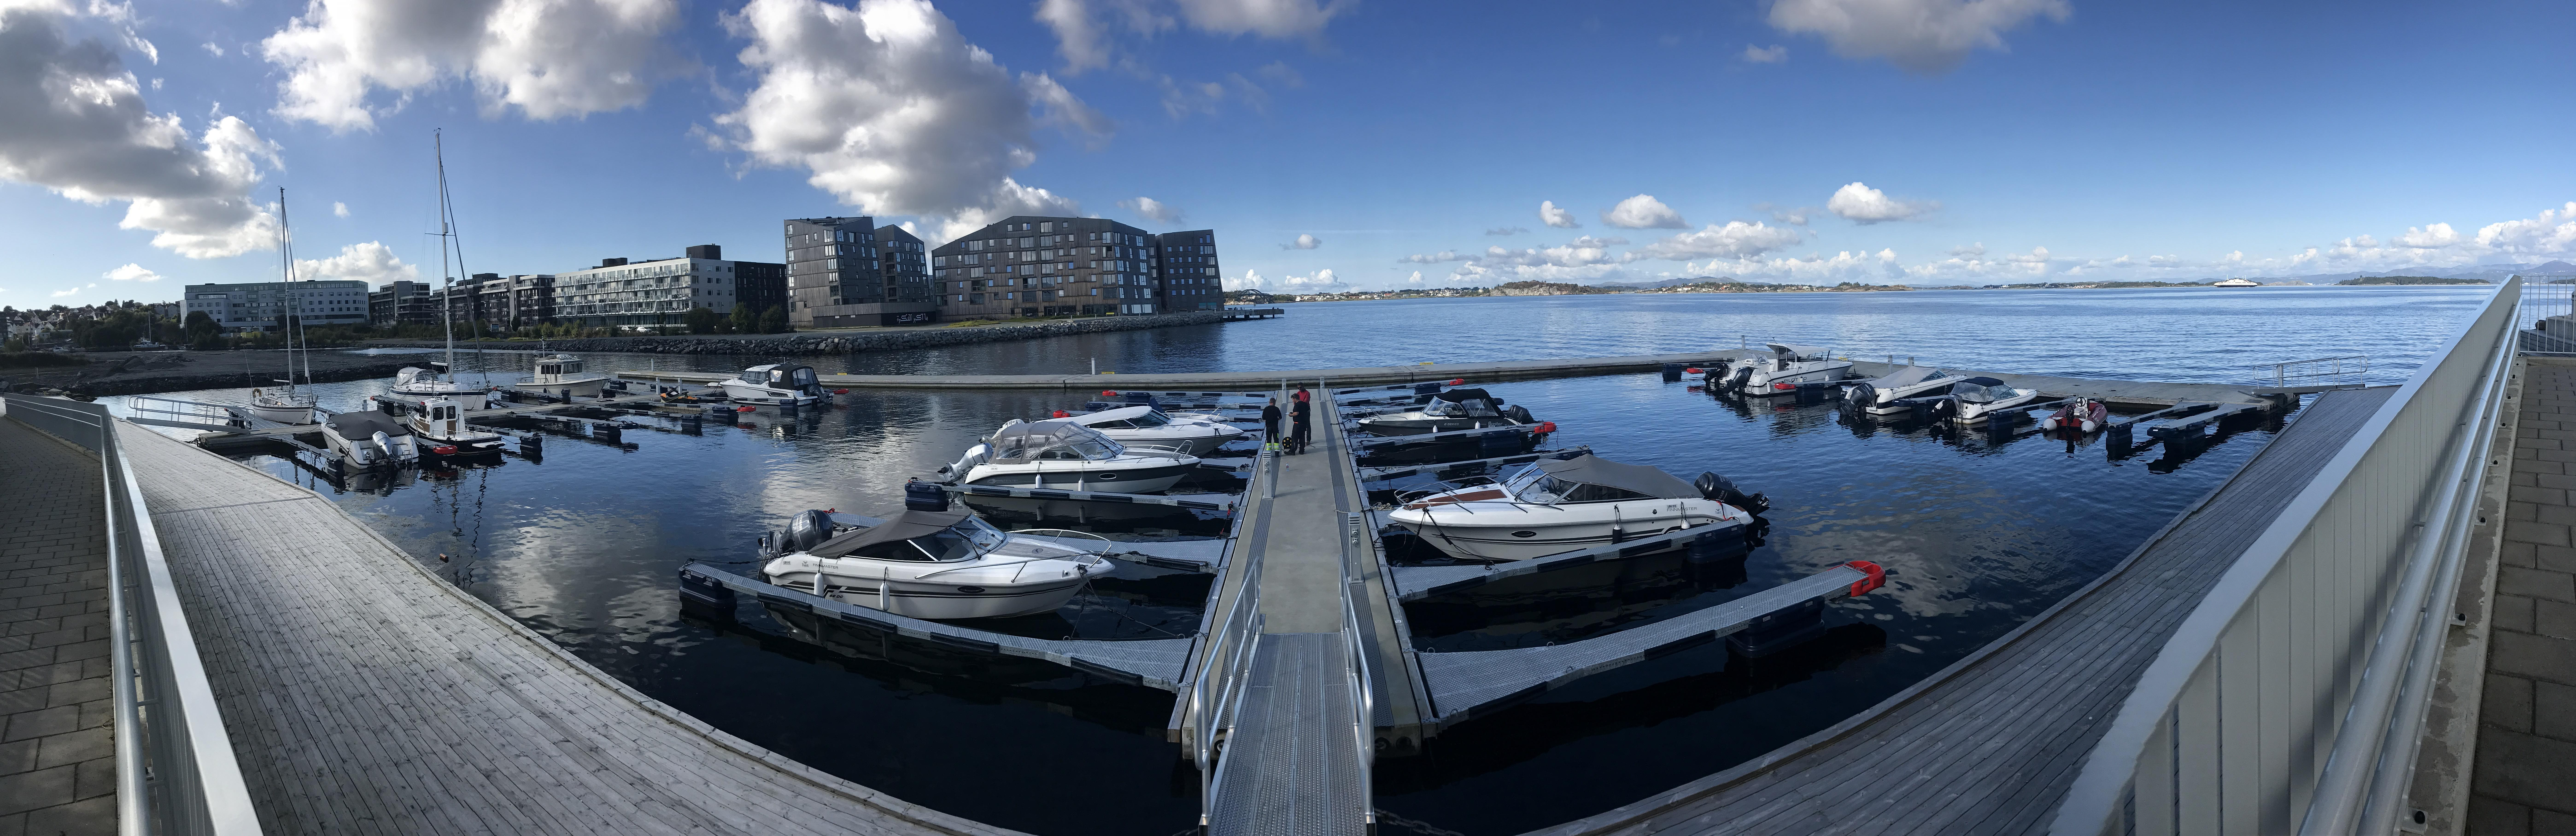 https://marinasolutions.no/uploads/Lervig-Brygge-Stavanger-Øst_2021-02-19-115231.JPG